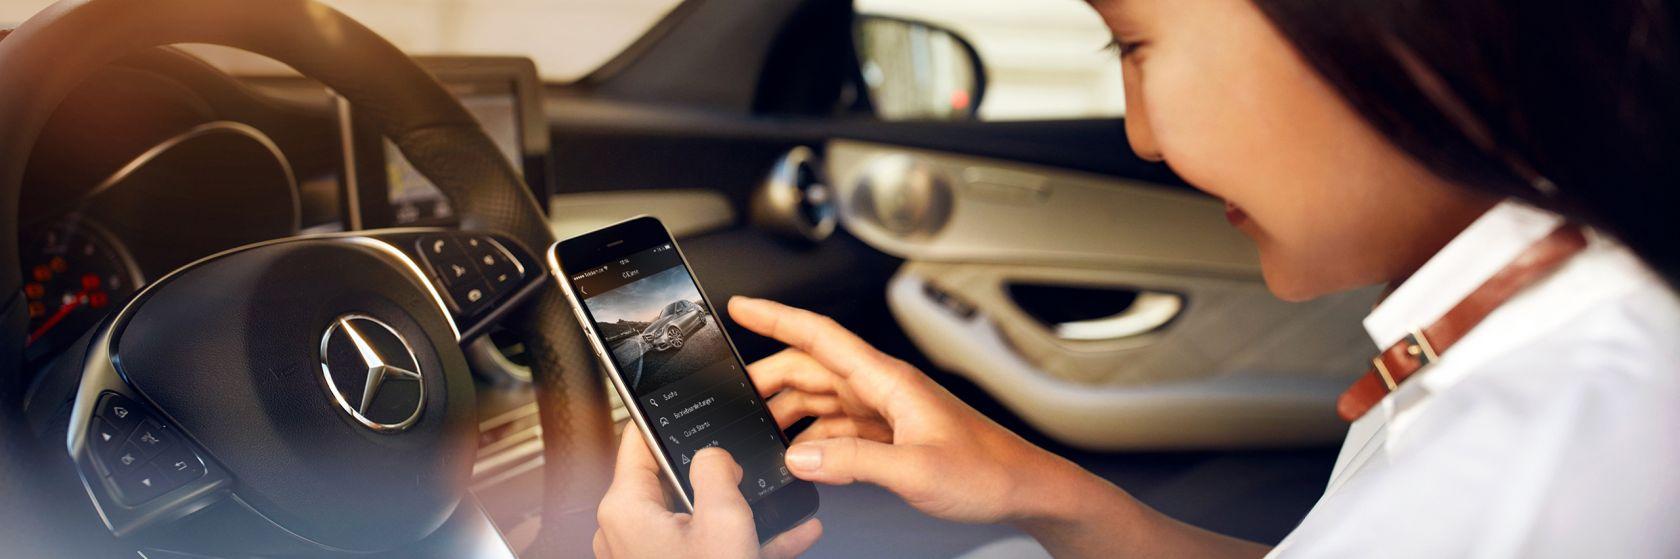 Mercedes-Benz: Interactive Owner's Manuals